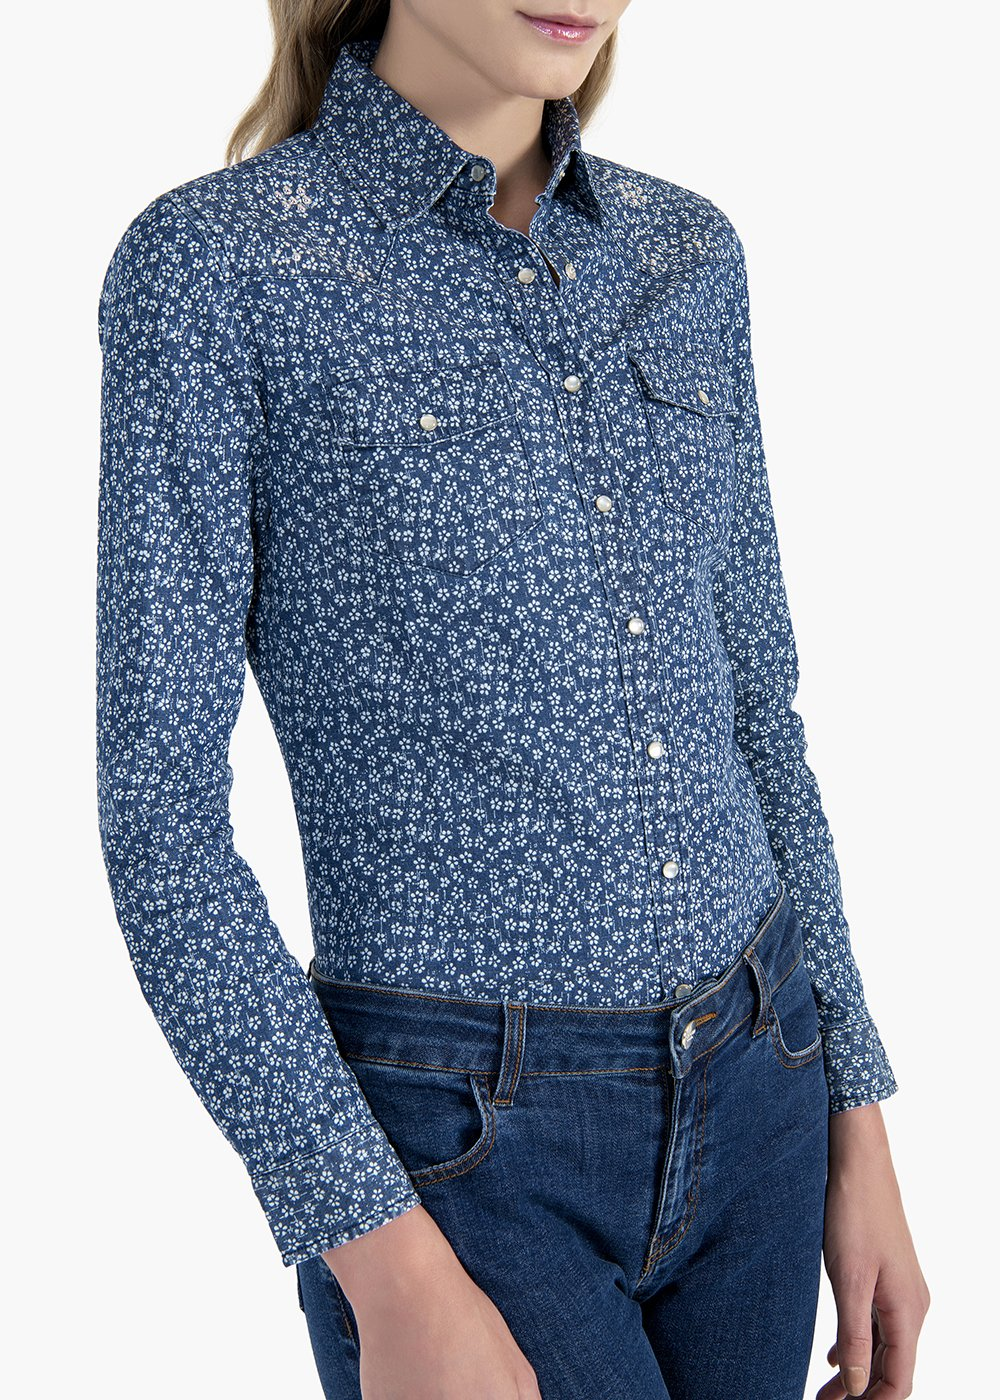 Caren shirt in stretch denim all over print - Denim / White / Fantasia - Woman